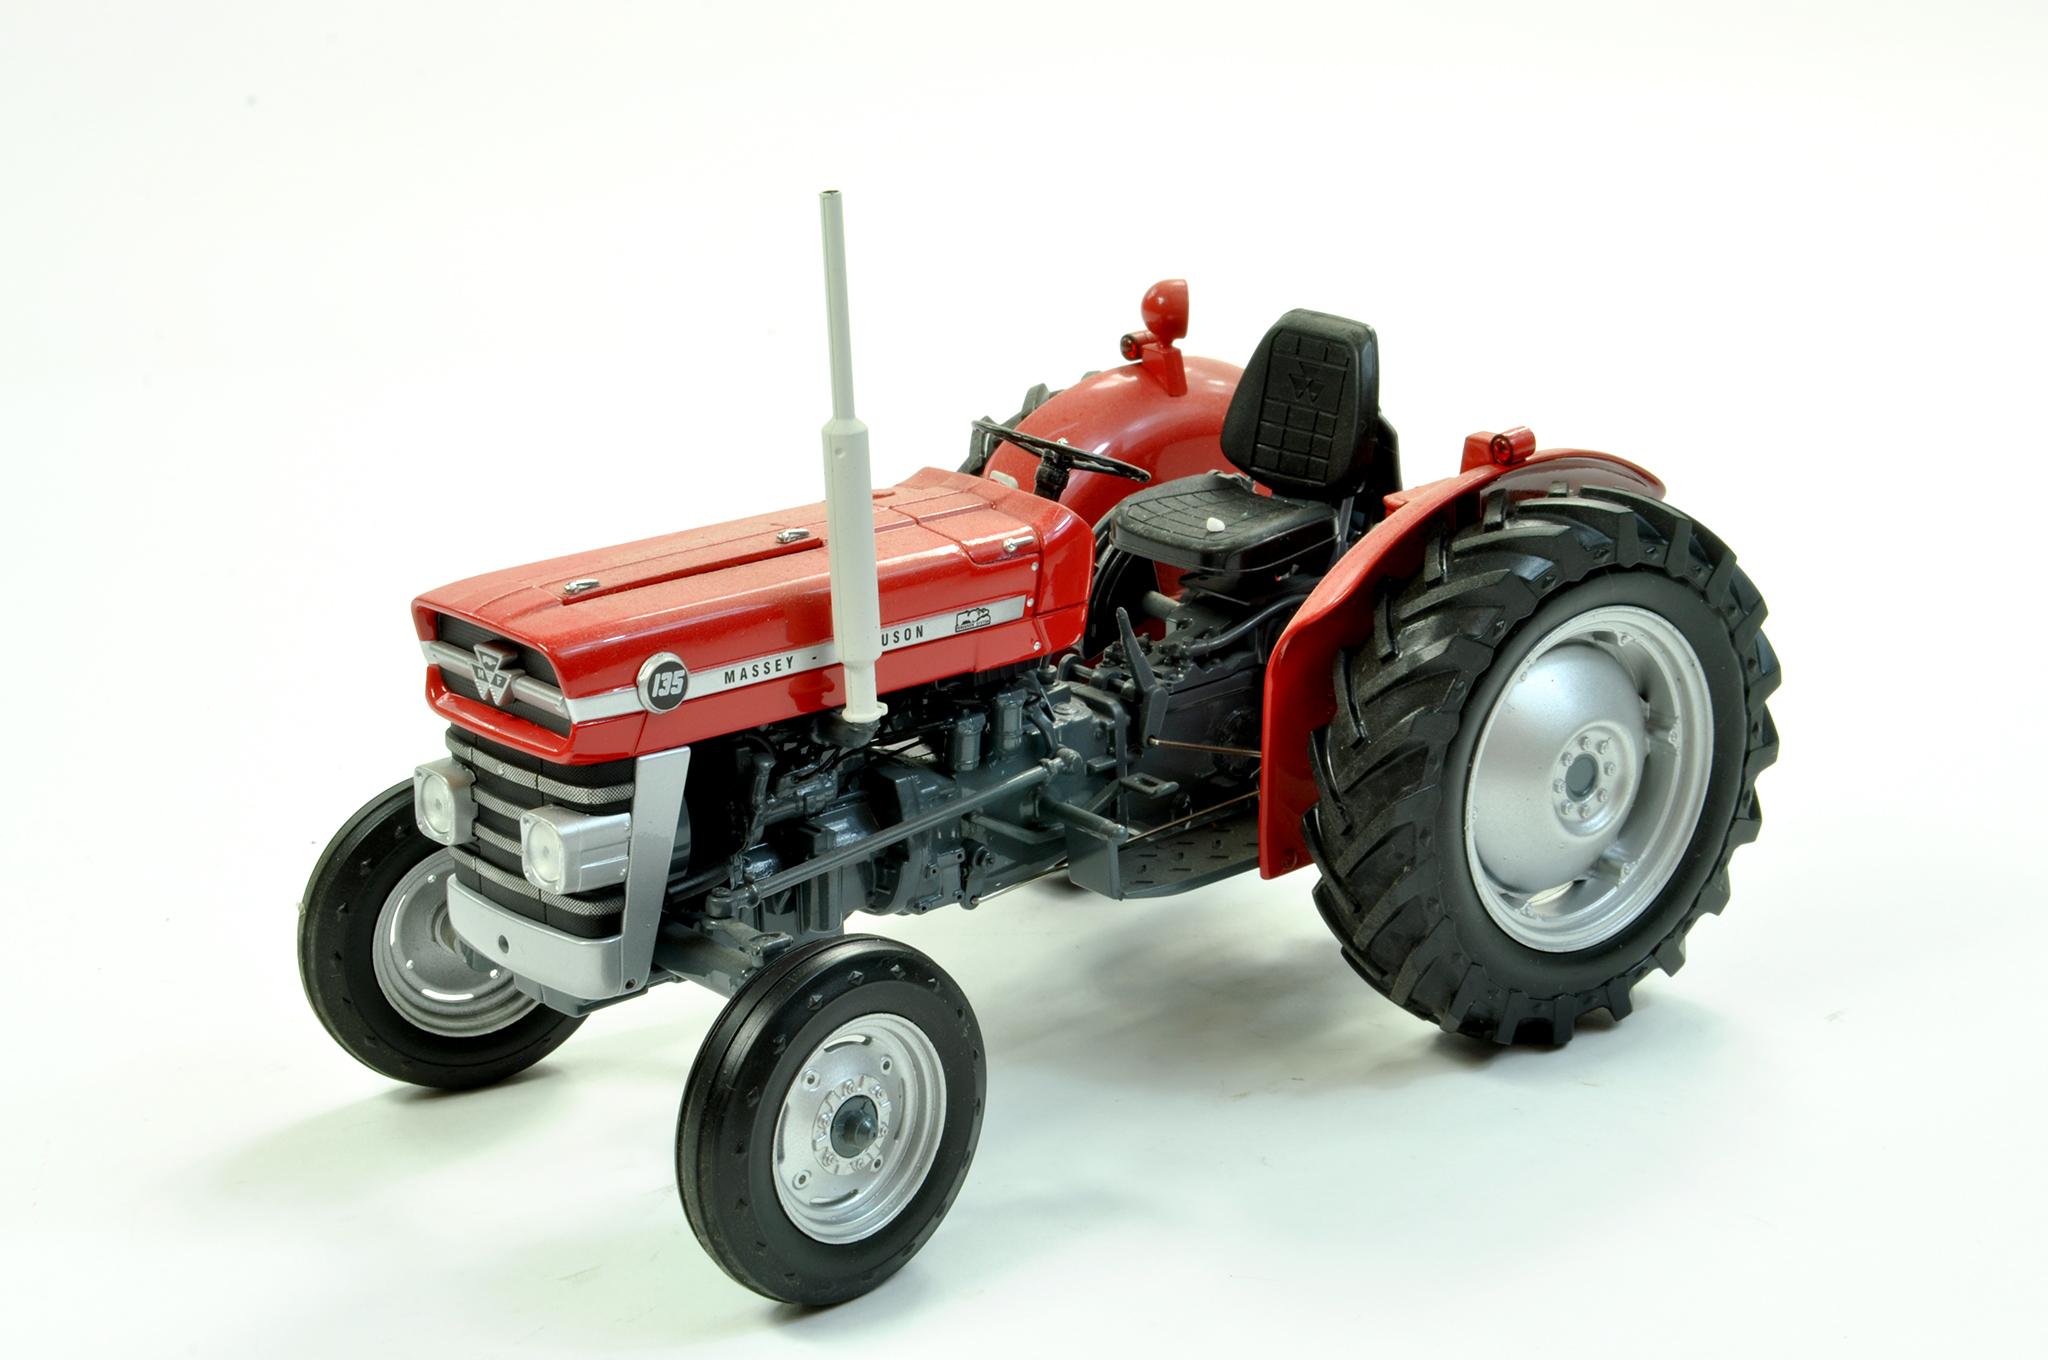 Lot 40 - Universal Hobbies 1/16 diecast farm issue comprising Massey Ferguson 135 Tractor. A little dusty but